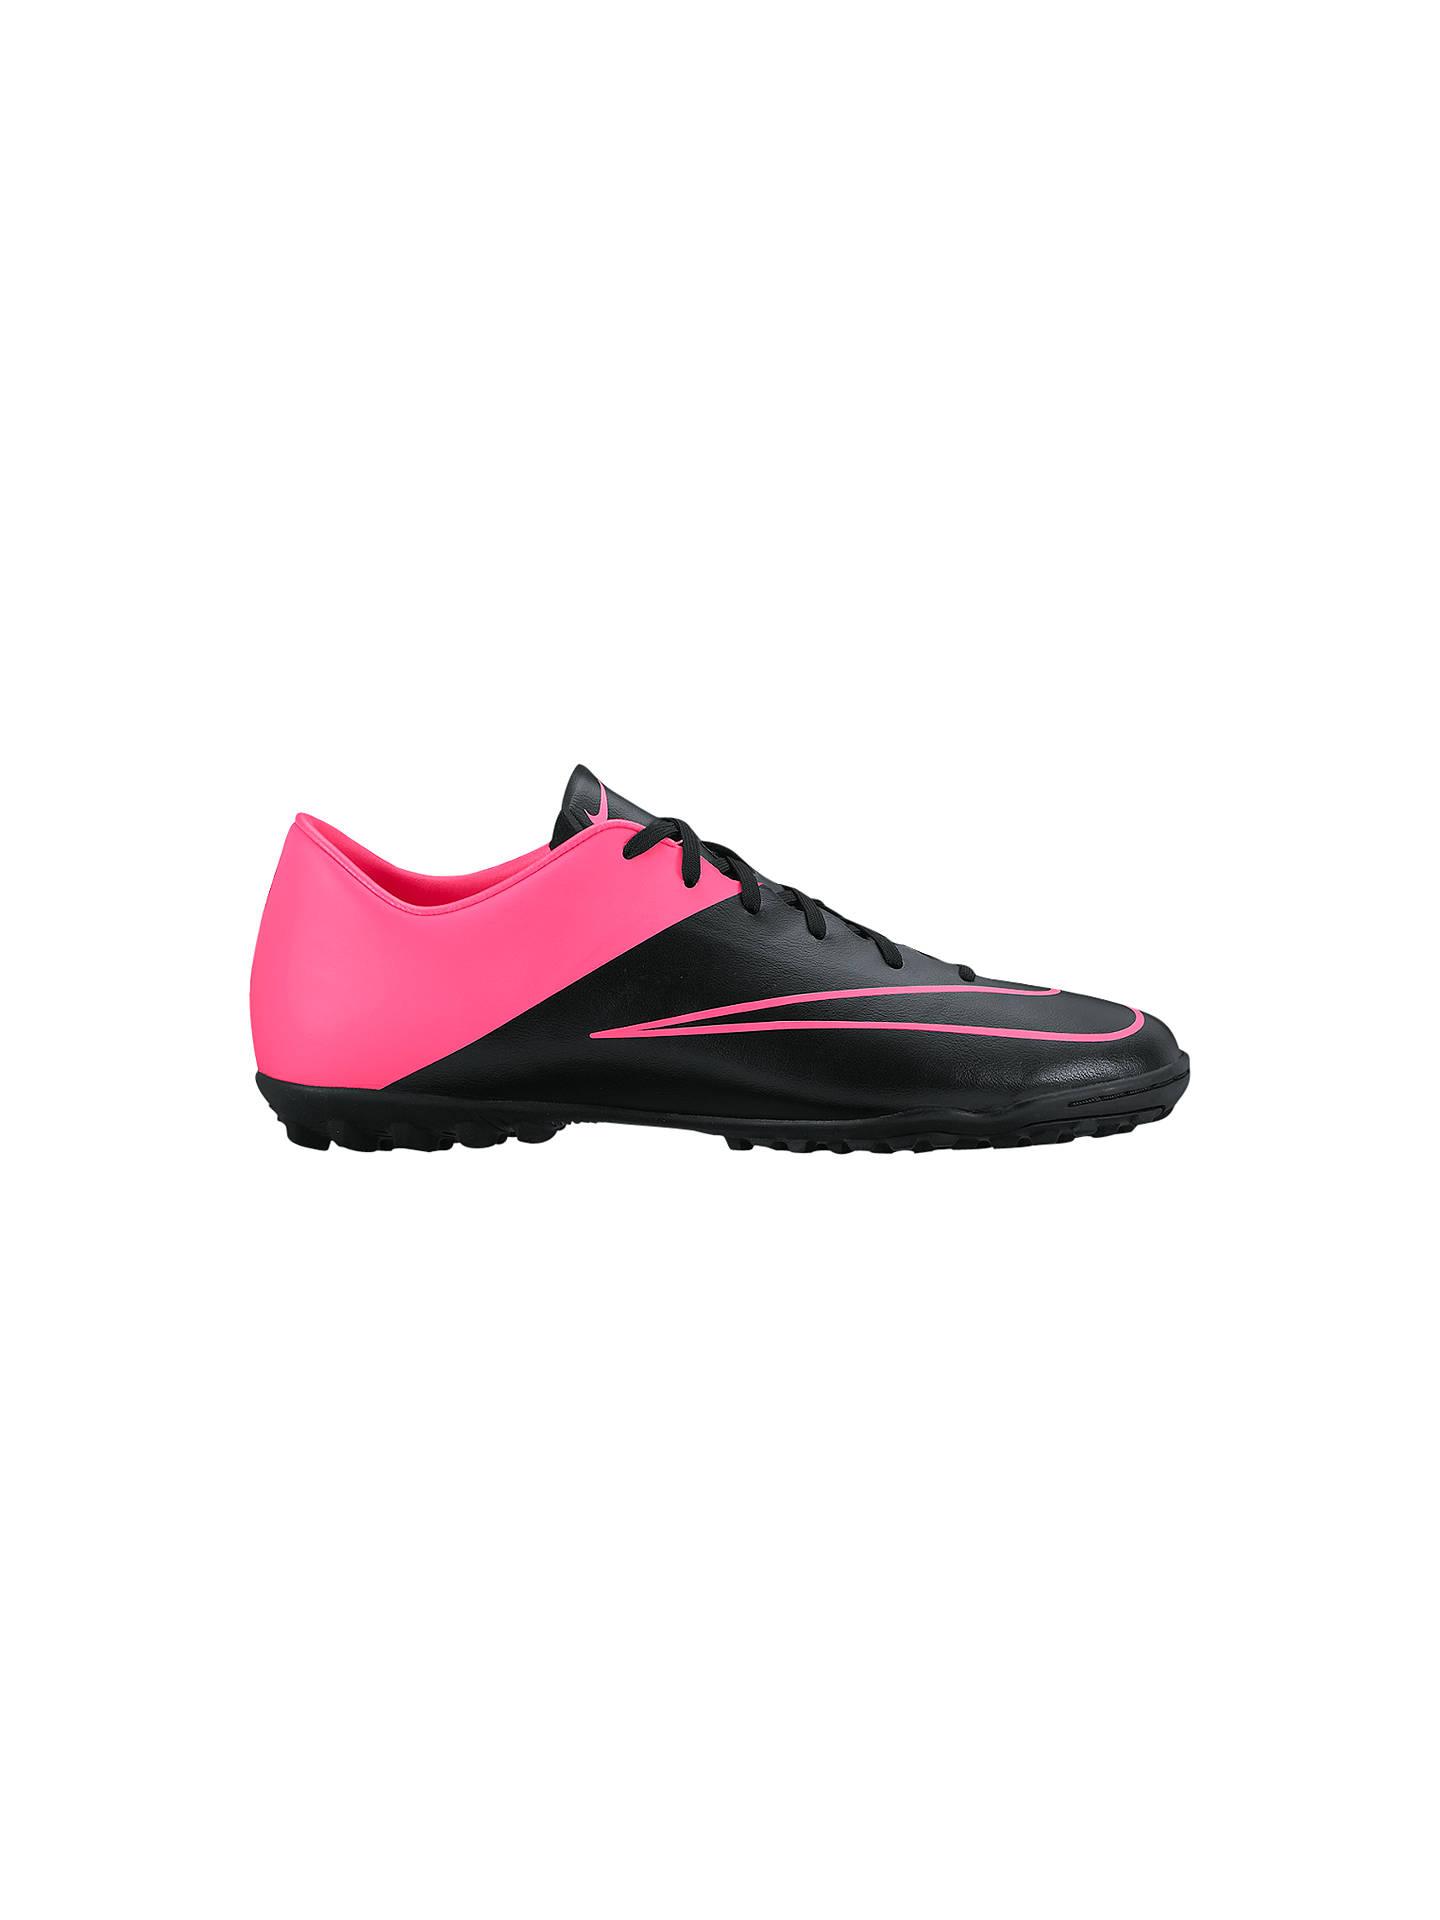 937a93cd3 Buy Nike Mercurial Victory V FG Men s Football Boots